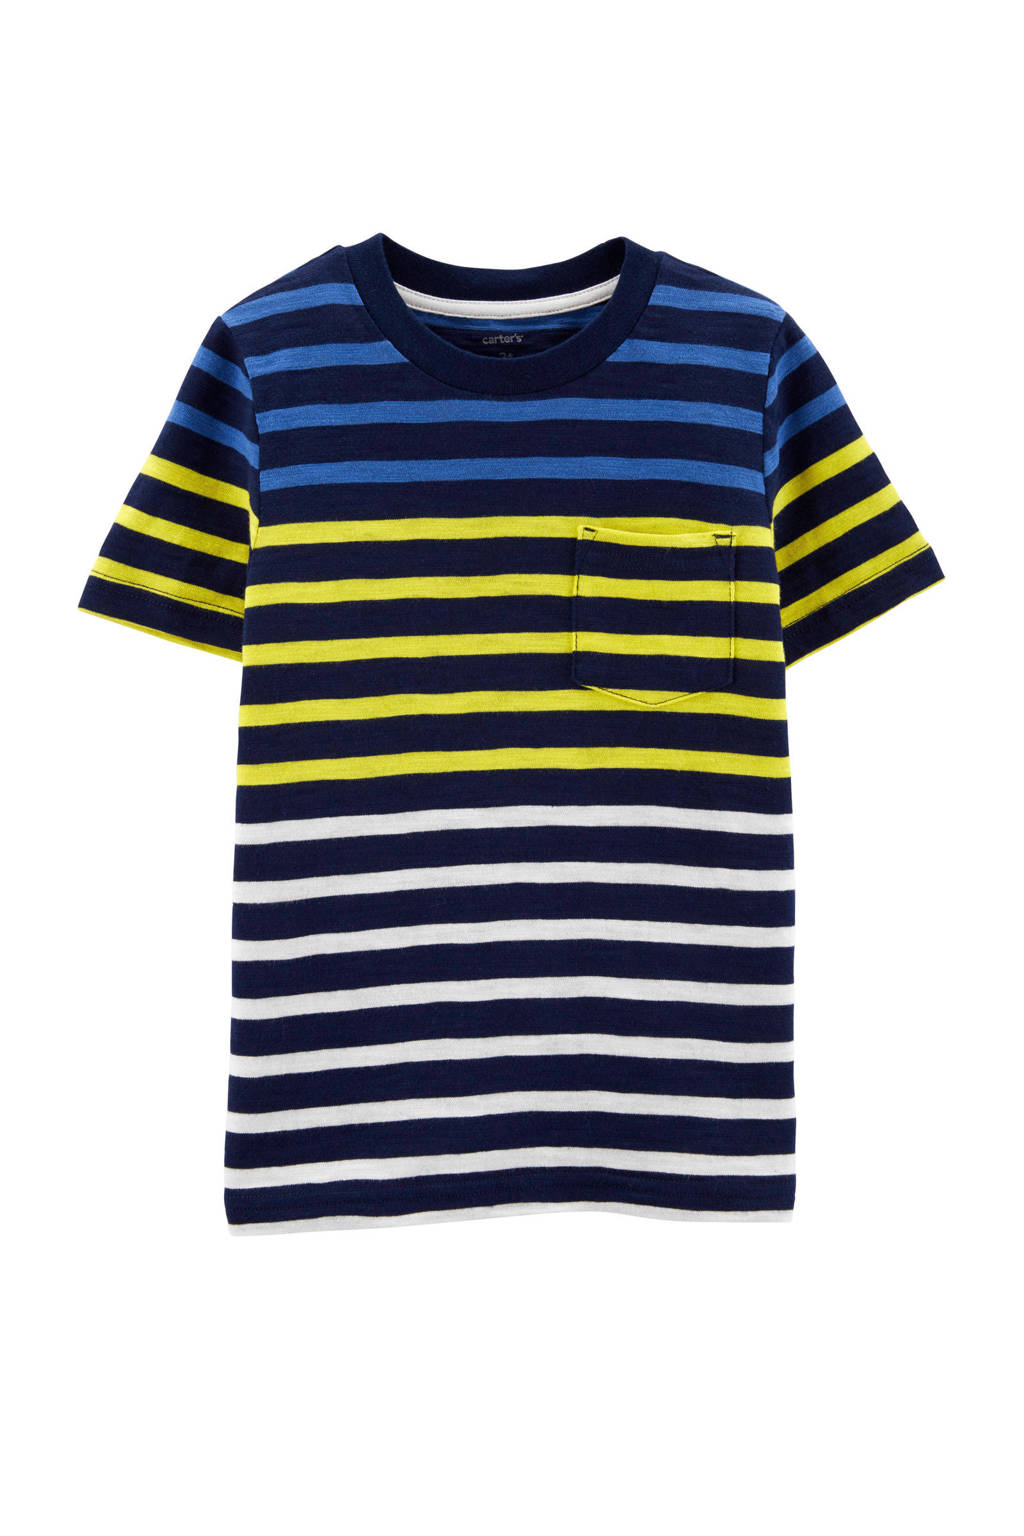 Carter's baby gestreept T-shirt donkerblauw, Donkerblauw